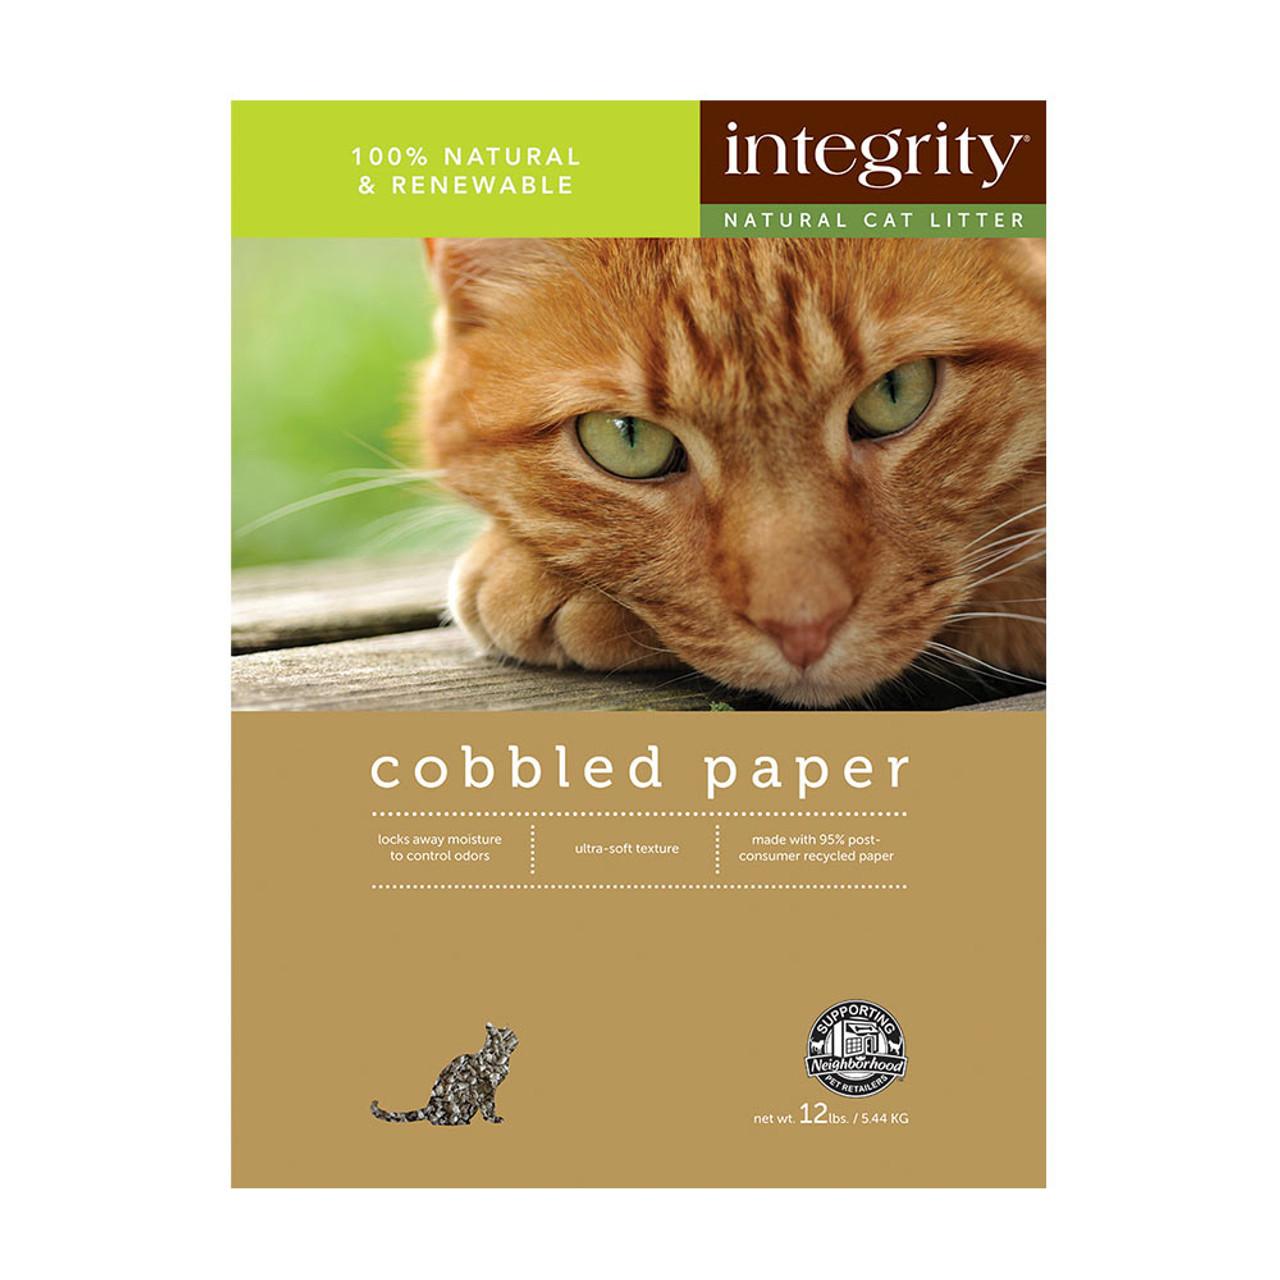 Integrity Cobbled Paper Cat Litter